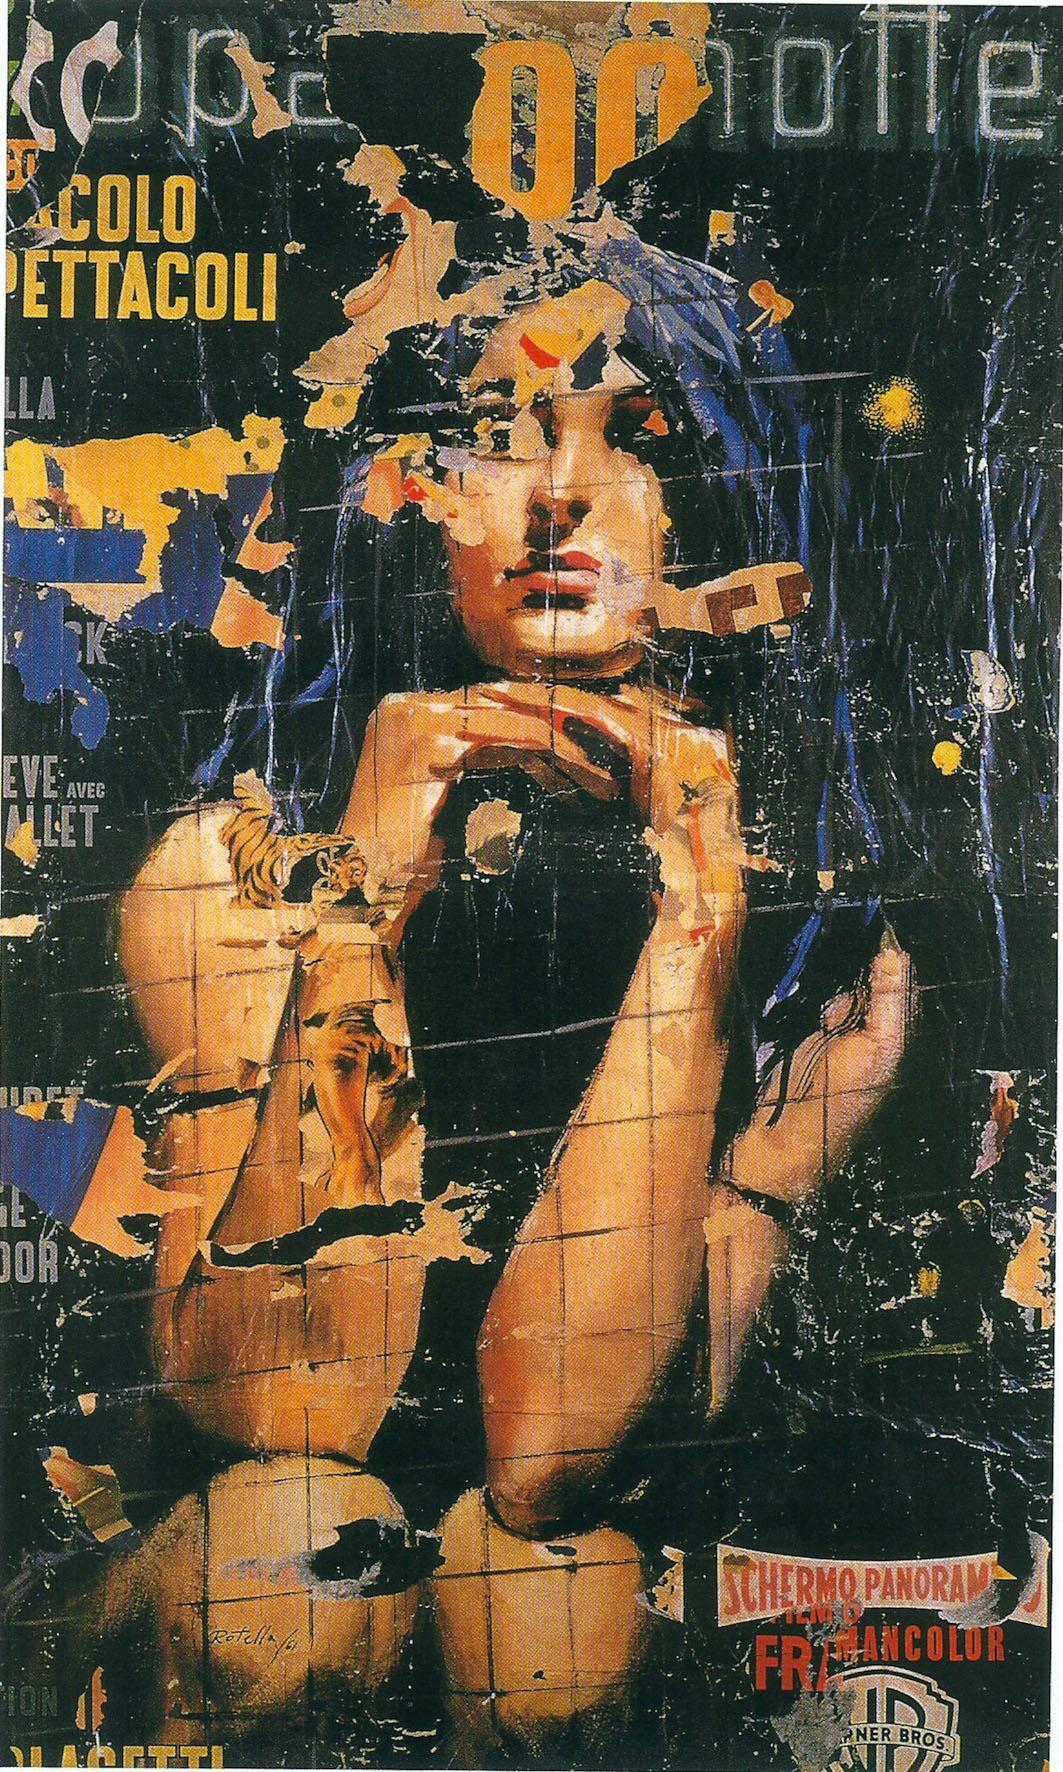 Mimmo Rotella, Europa di notte, 1961, décollage su tela, cm 182x108, Wien, Museum moderner kunst stiftung Ludwig Wien